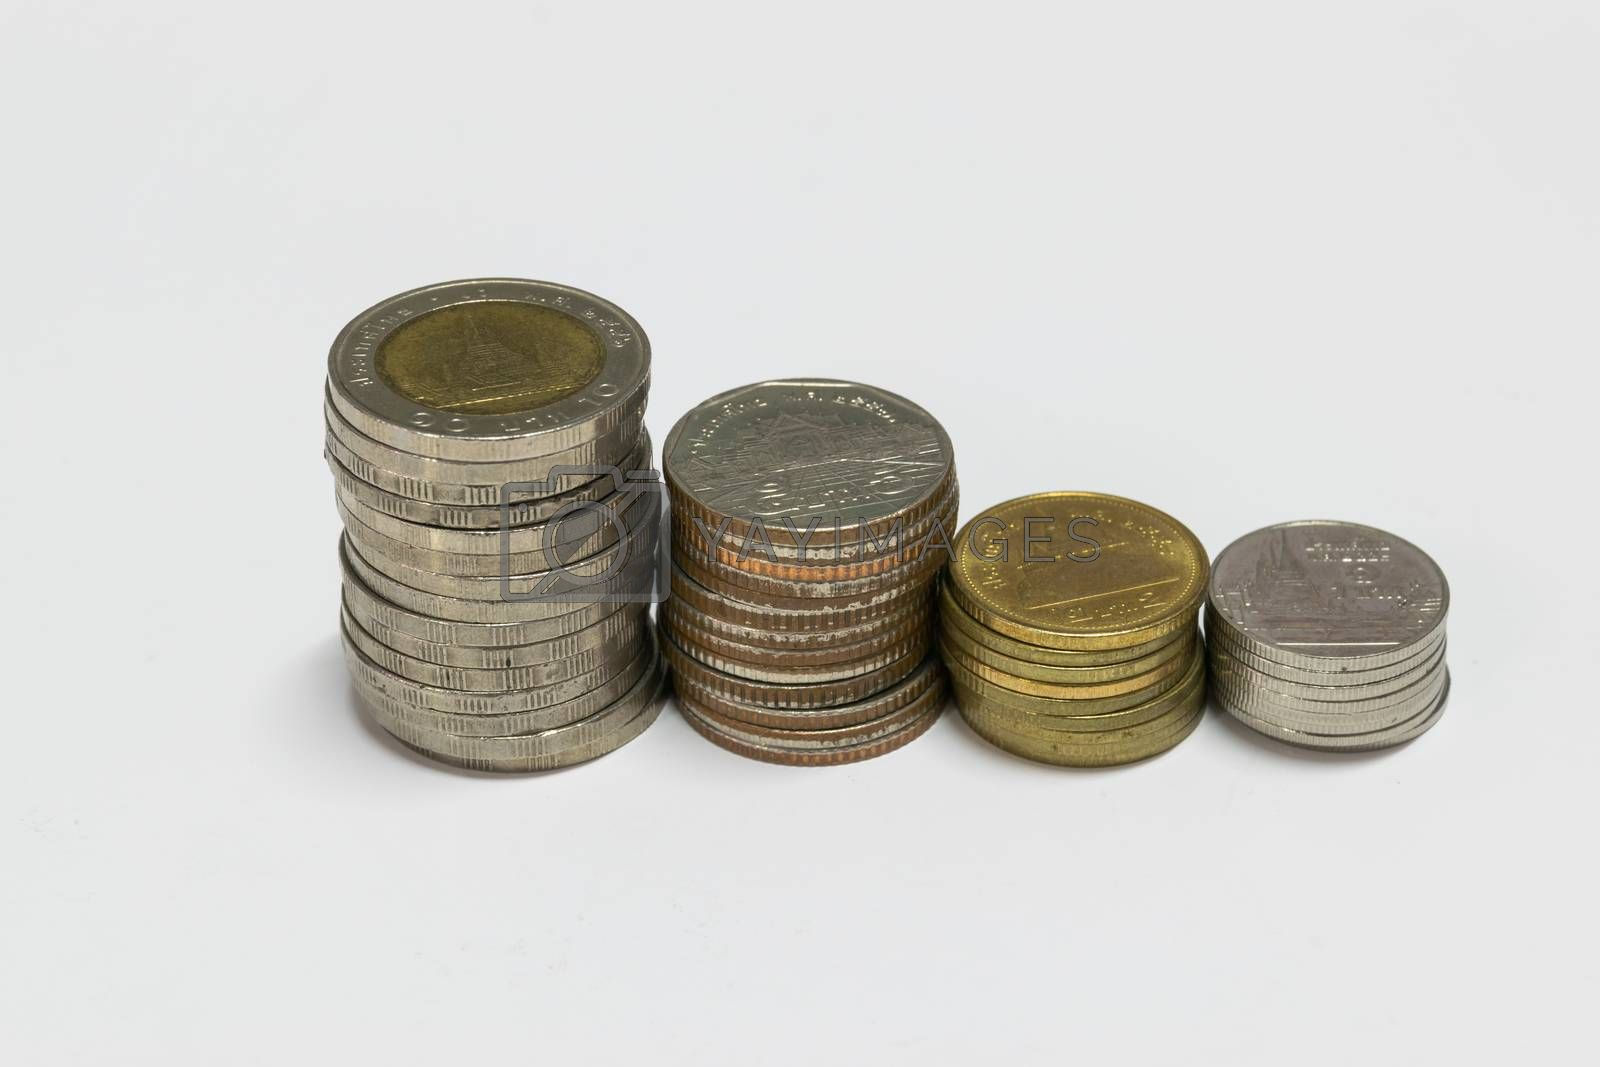 Thailand bath the basic monetary unit of Thailand 1 bath equal to 100 satangs